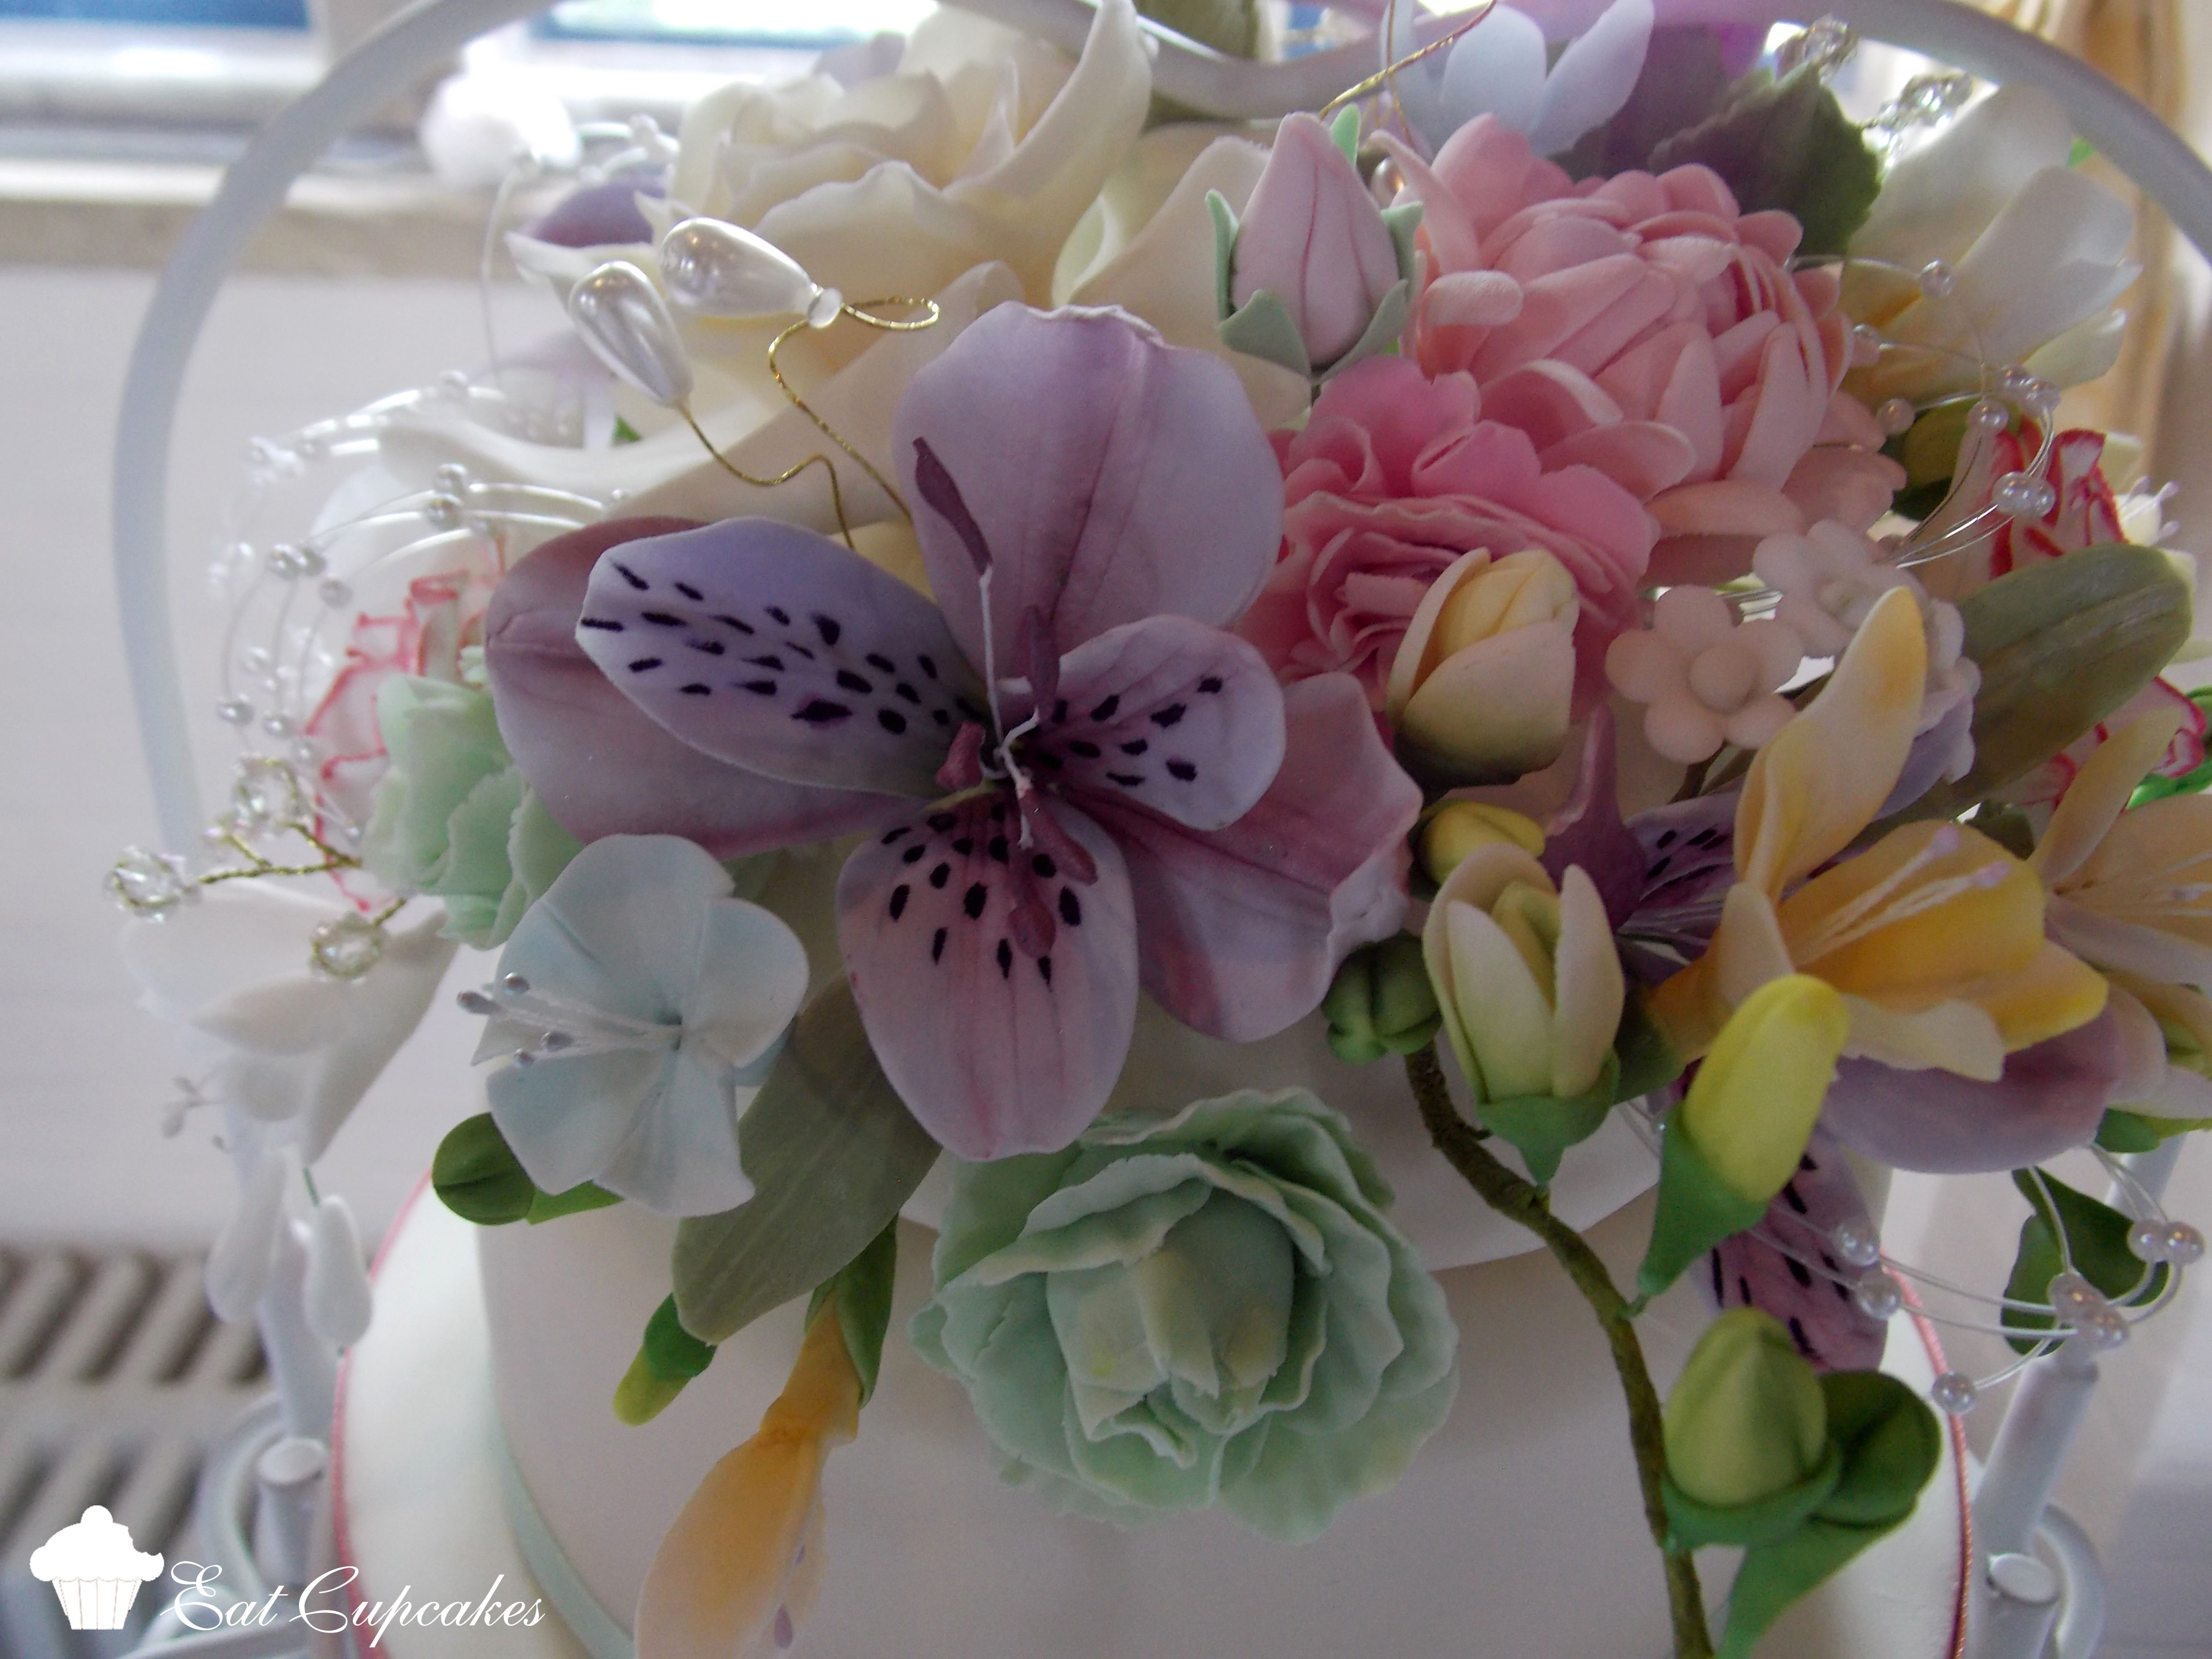 Graceful Tiers Wedding Cake Sugar Freesias, Chrysanths, Alstromeria lilies, carnations and filler flowers.